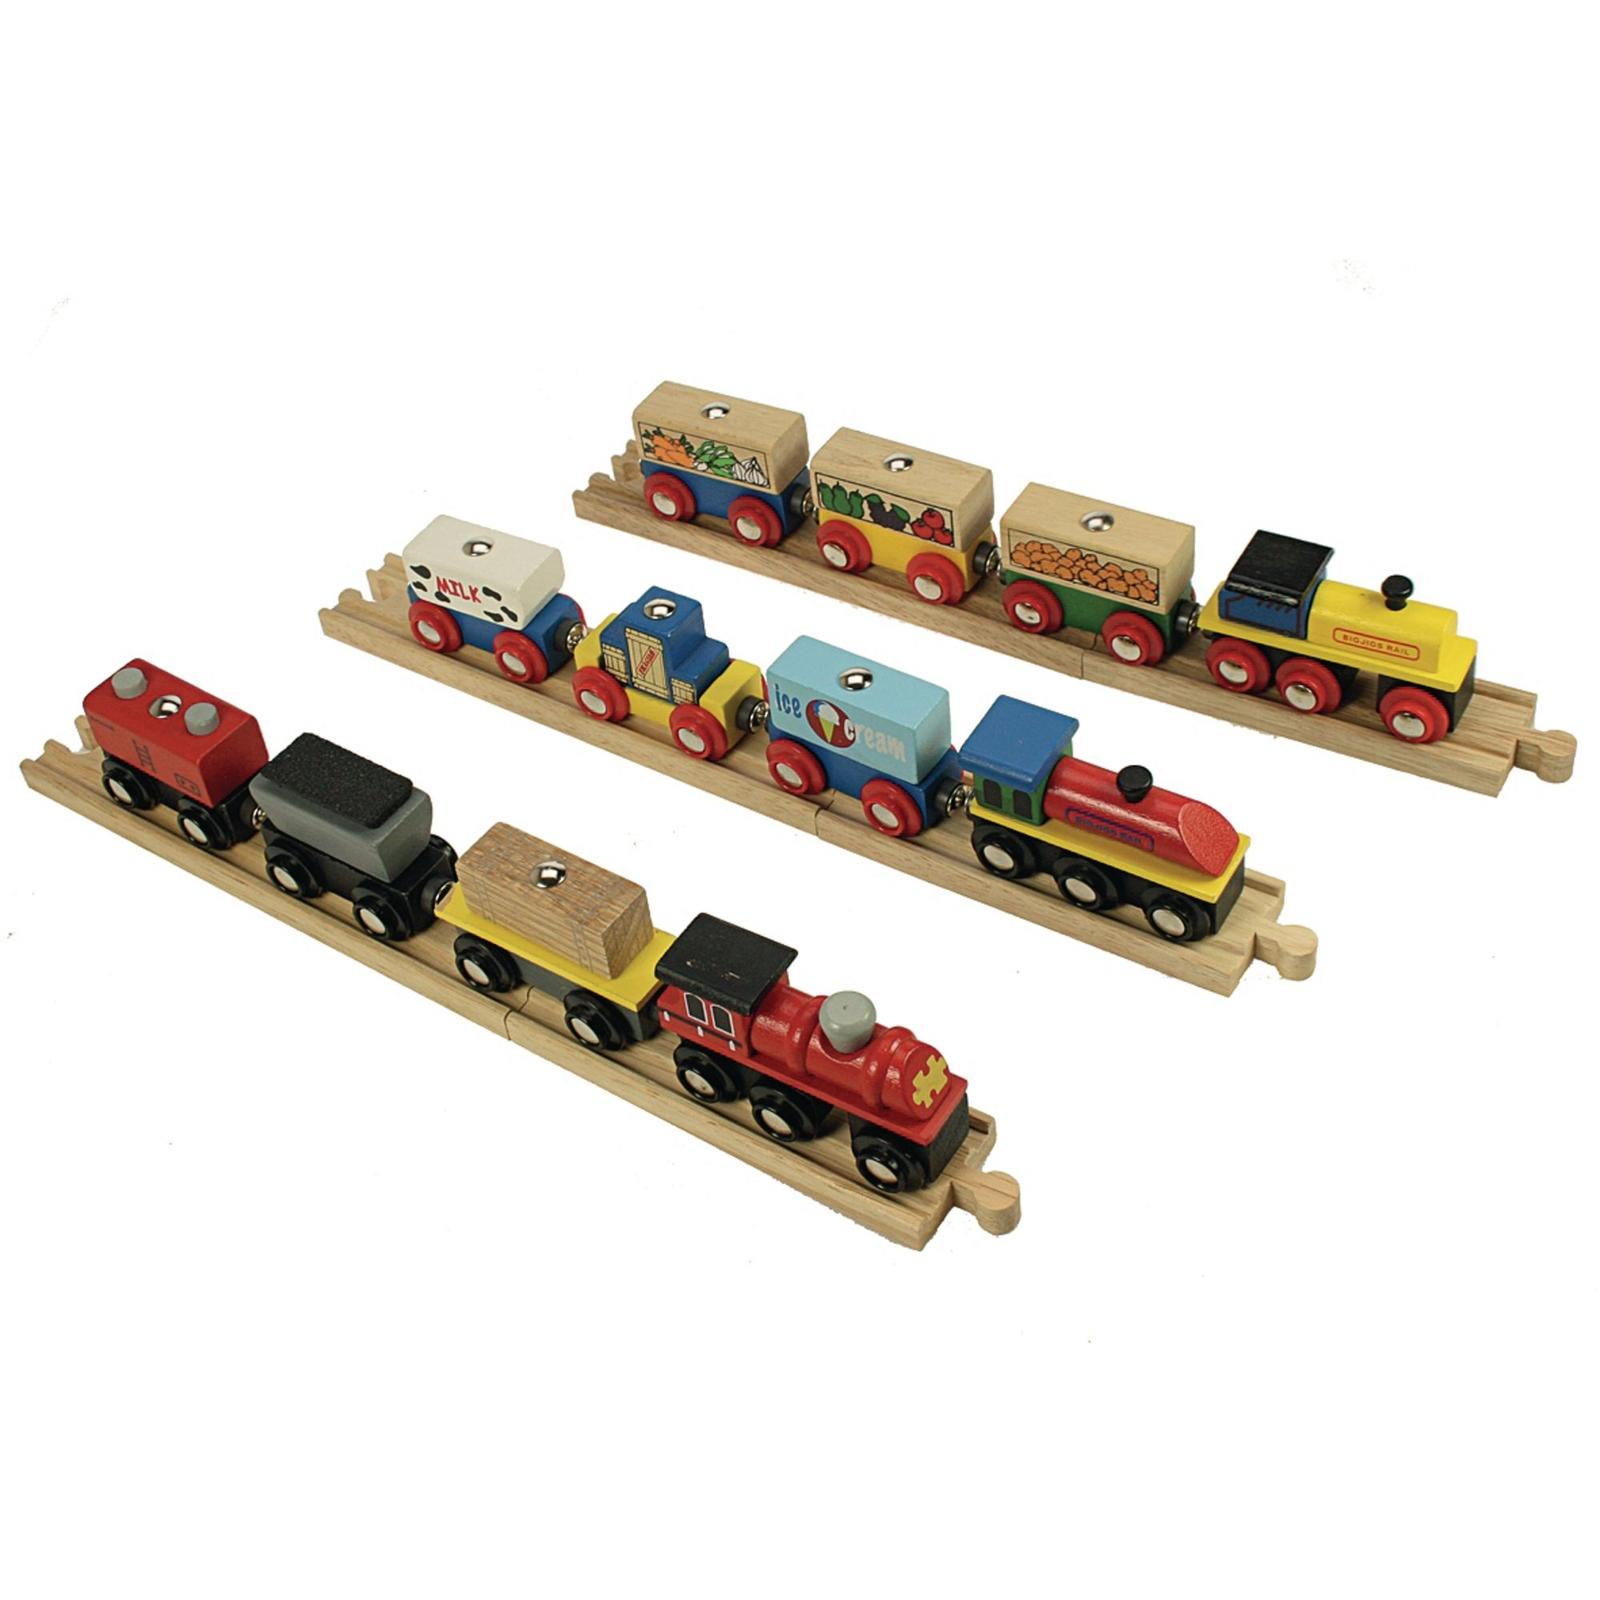 Transportation Trains - Pack of 3